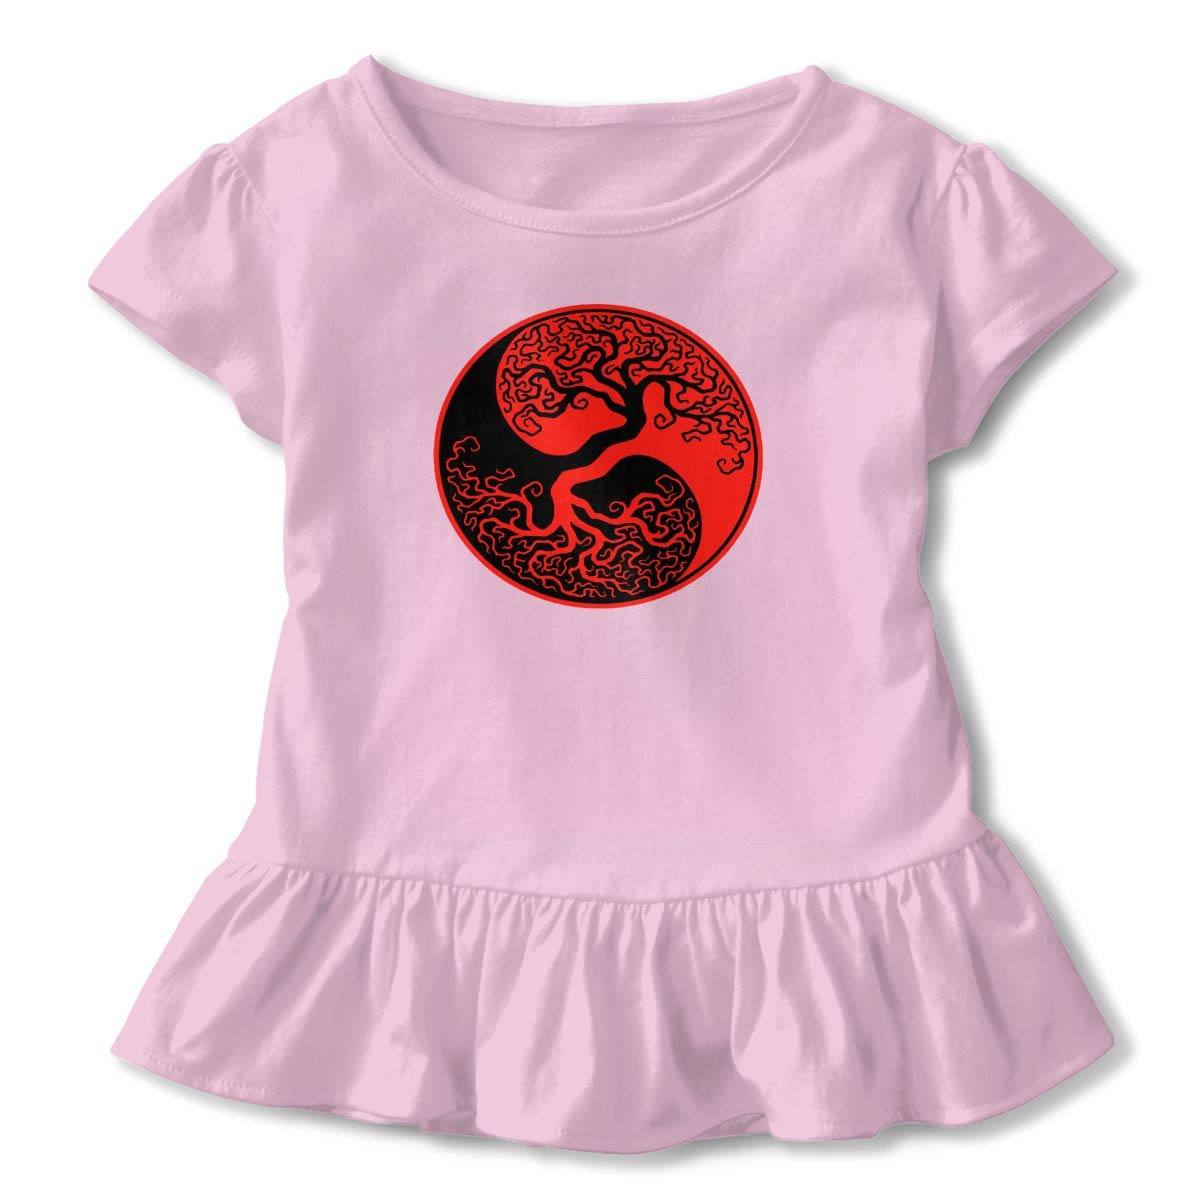 Metzuyan Infant Girls Frill Outfit Sleeveless Top Shorts Set